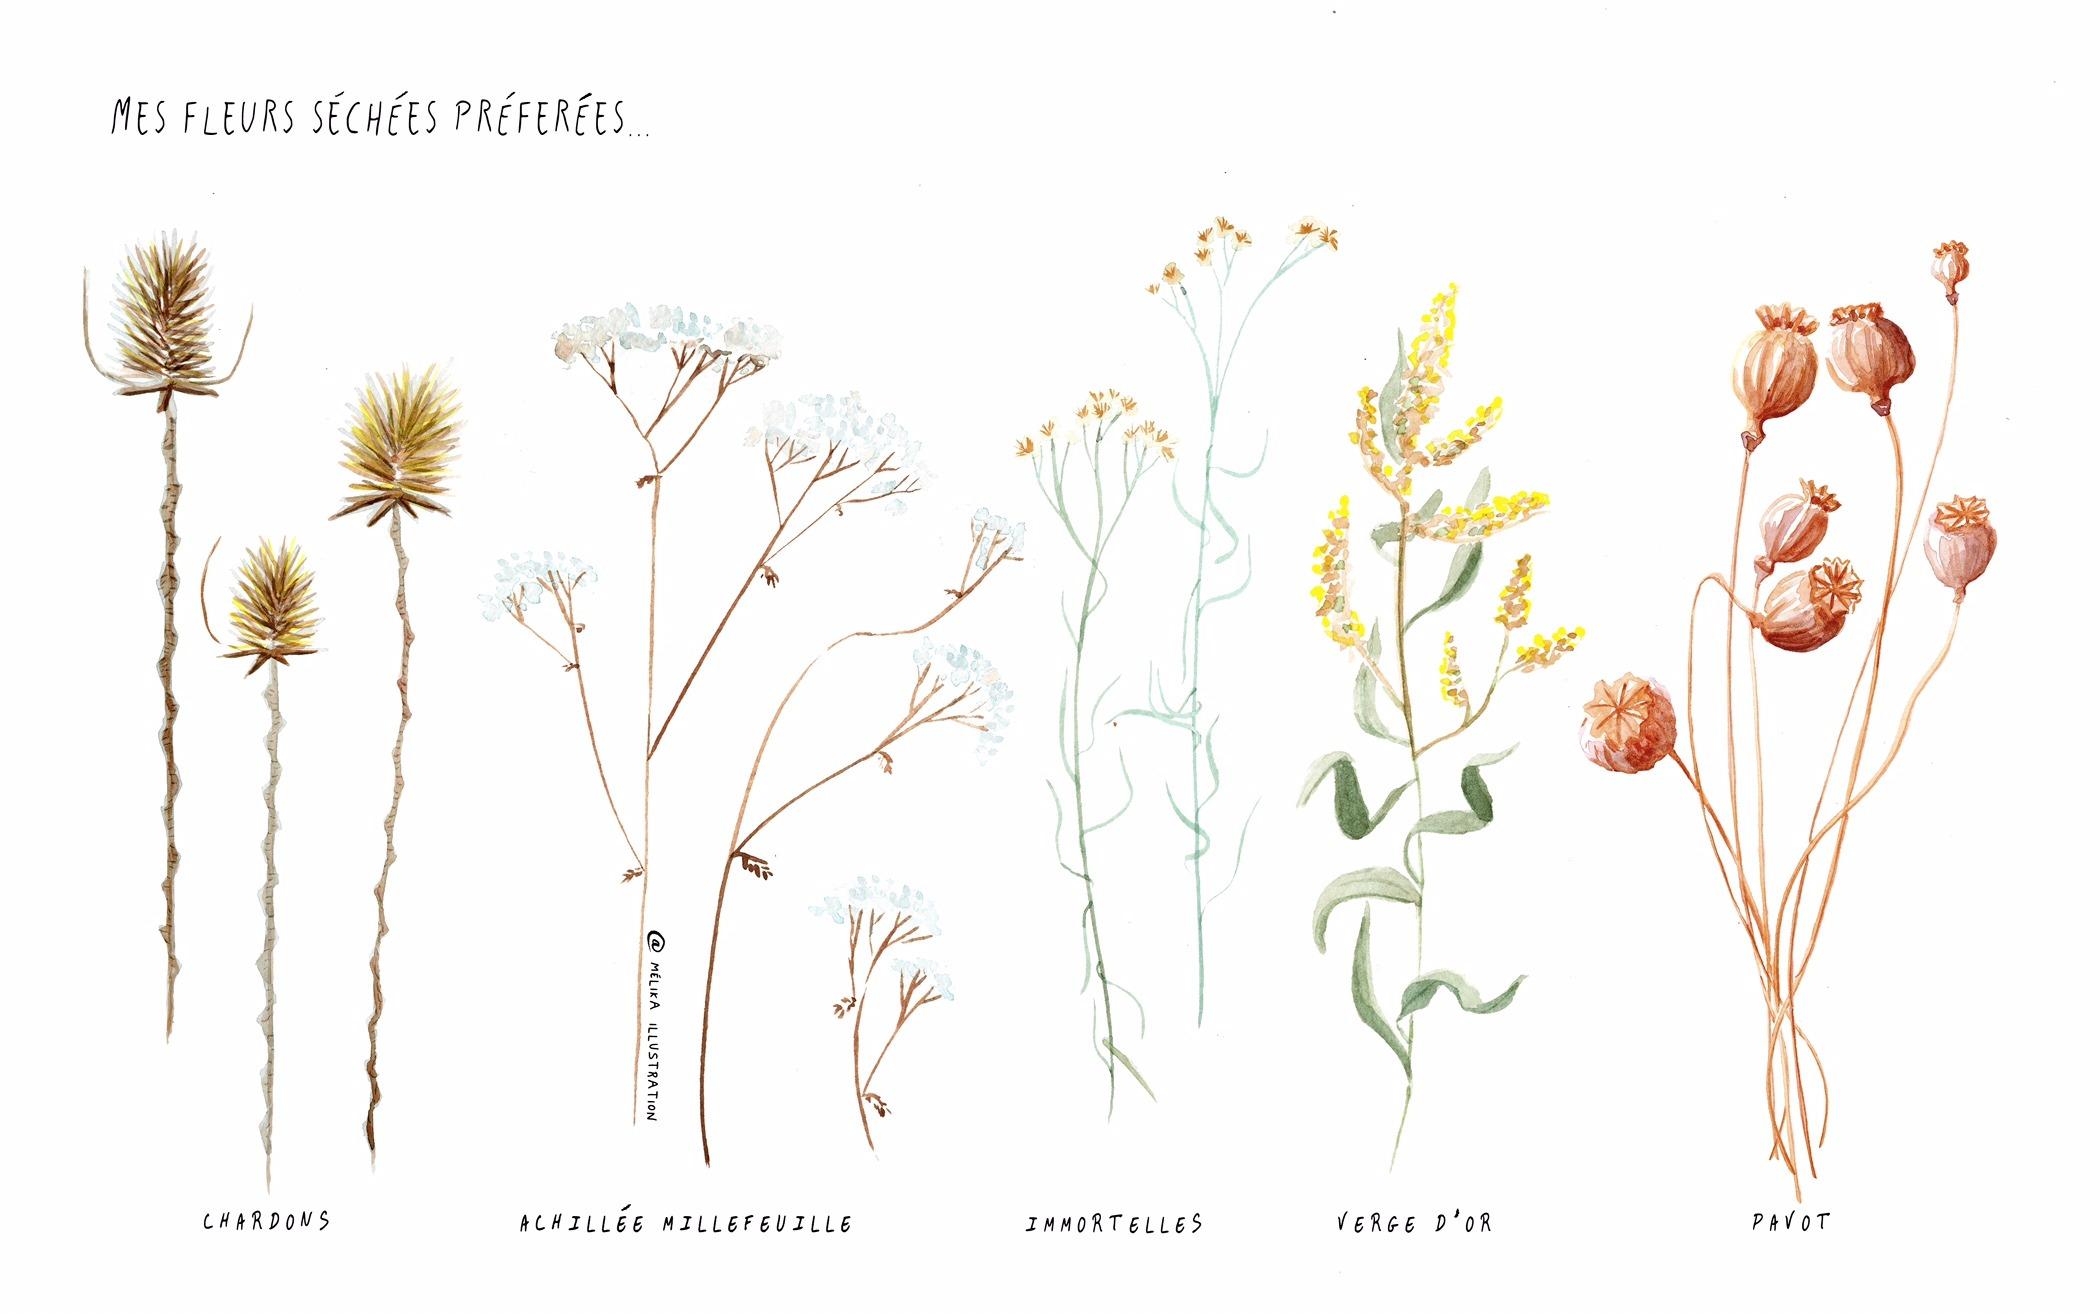 Illustration de mes fleurs sechEes preferees